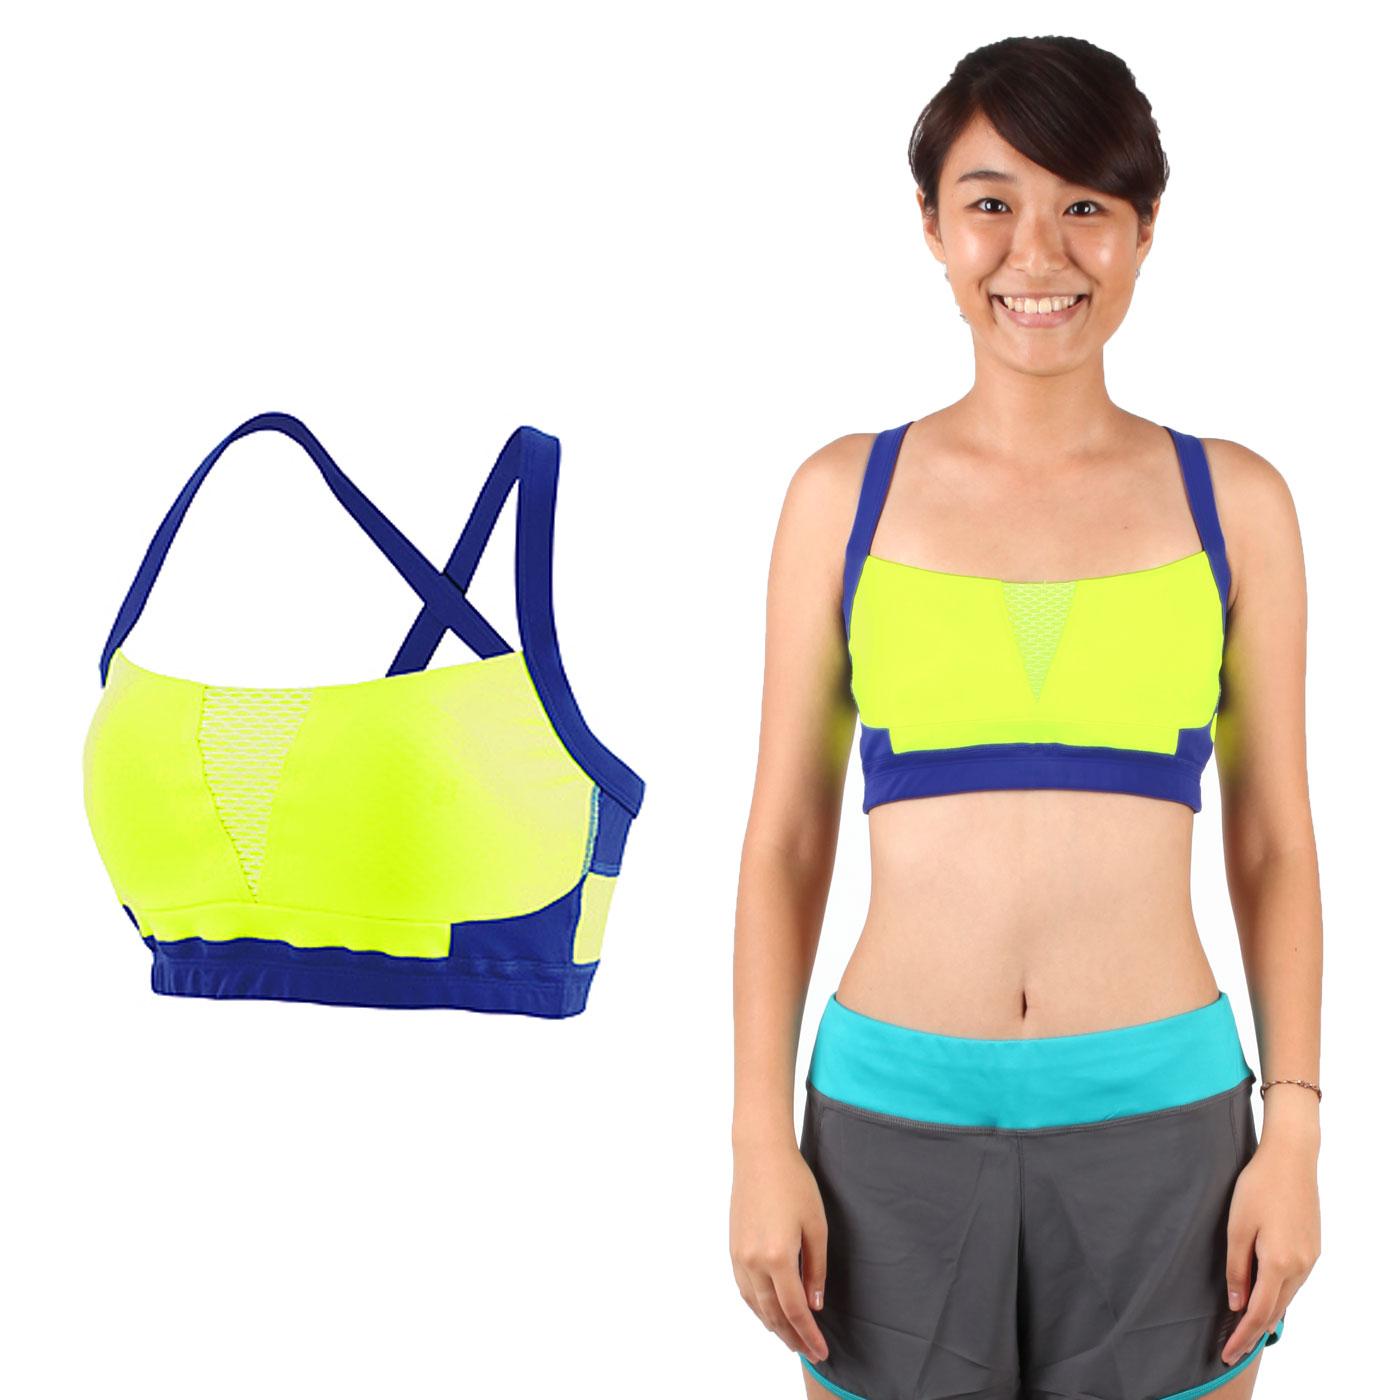 NEW BALANCE 女款運動內衣 6111520235 - 螢光黃藍